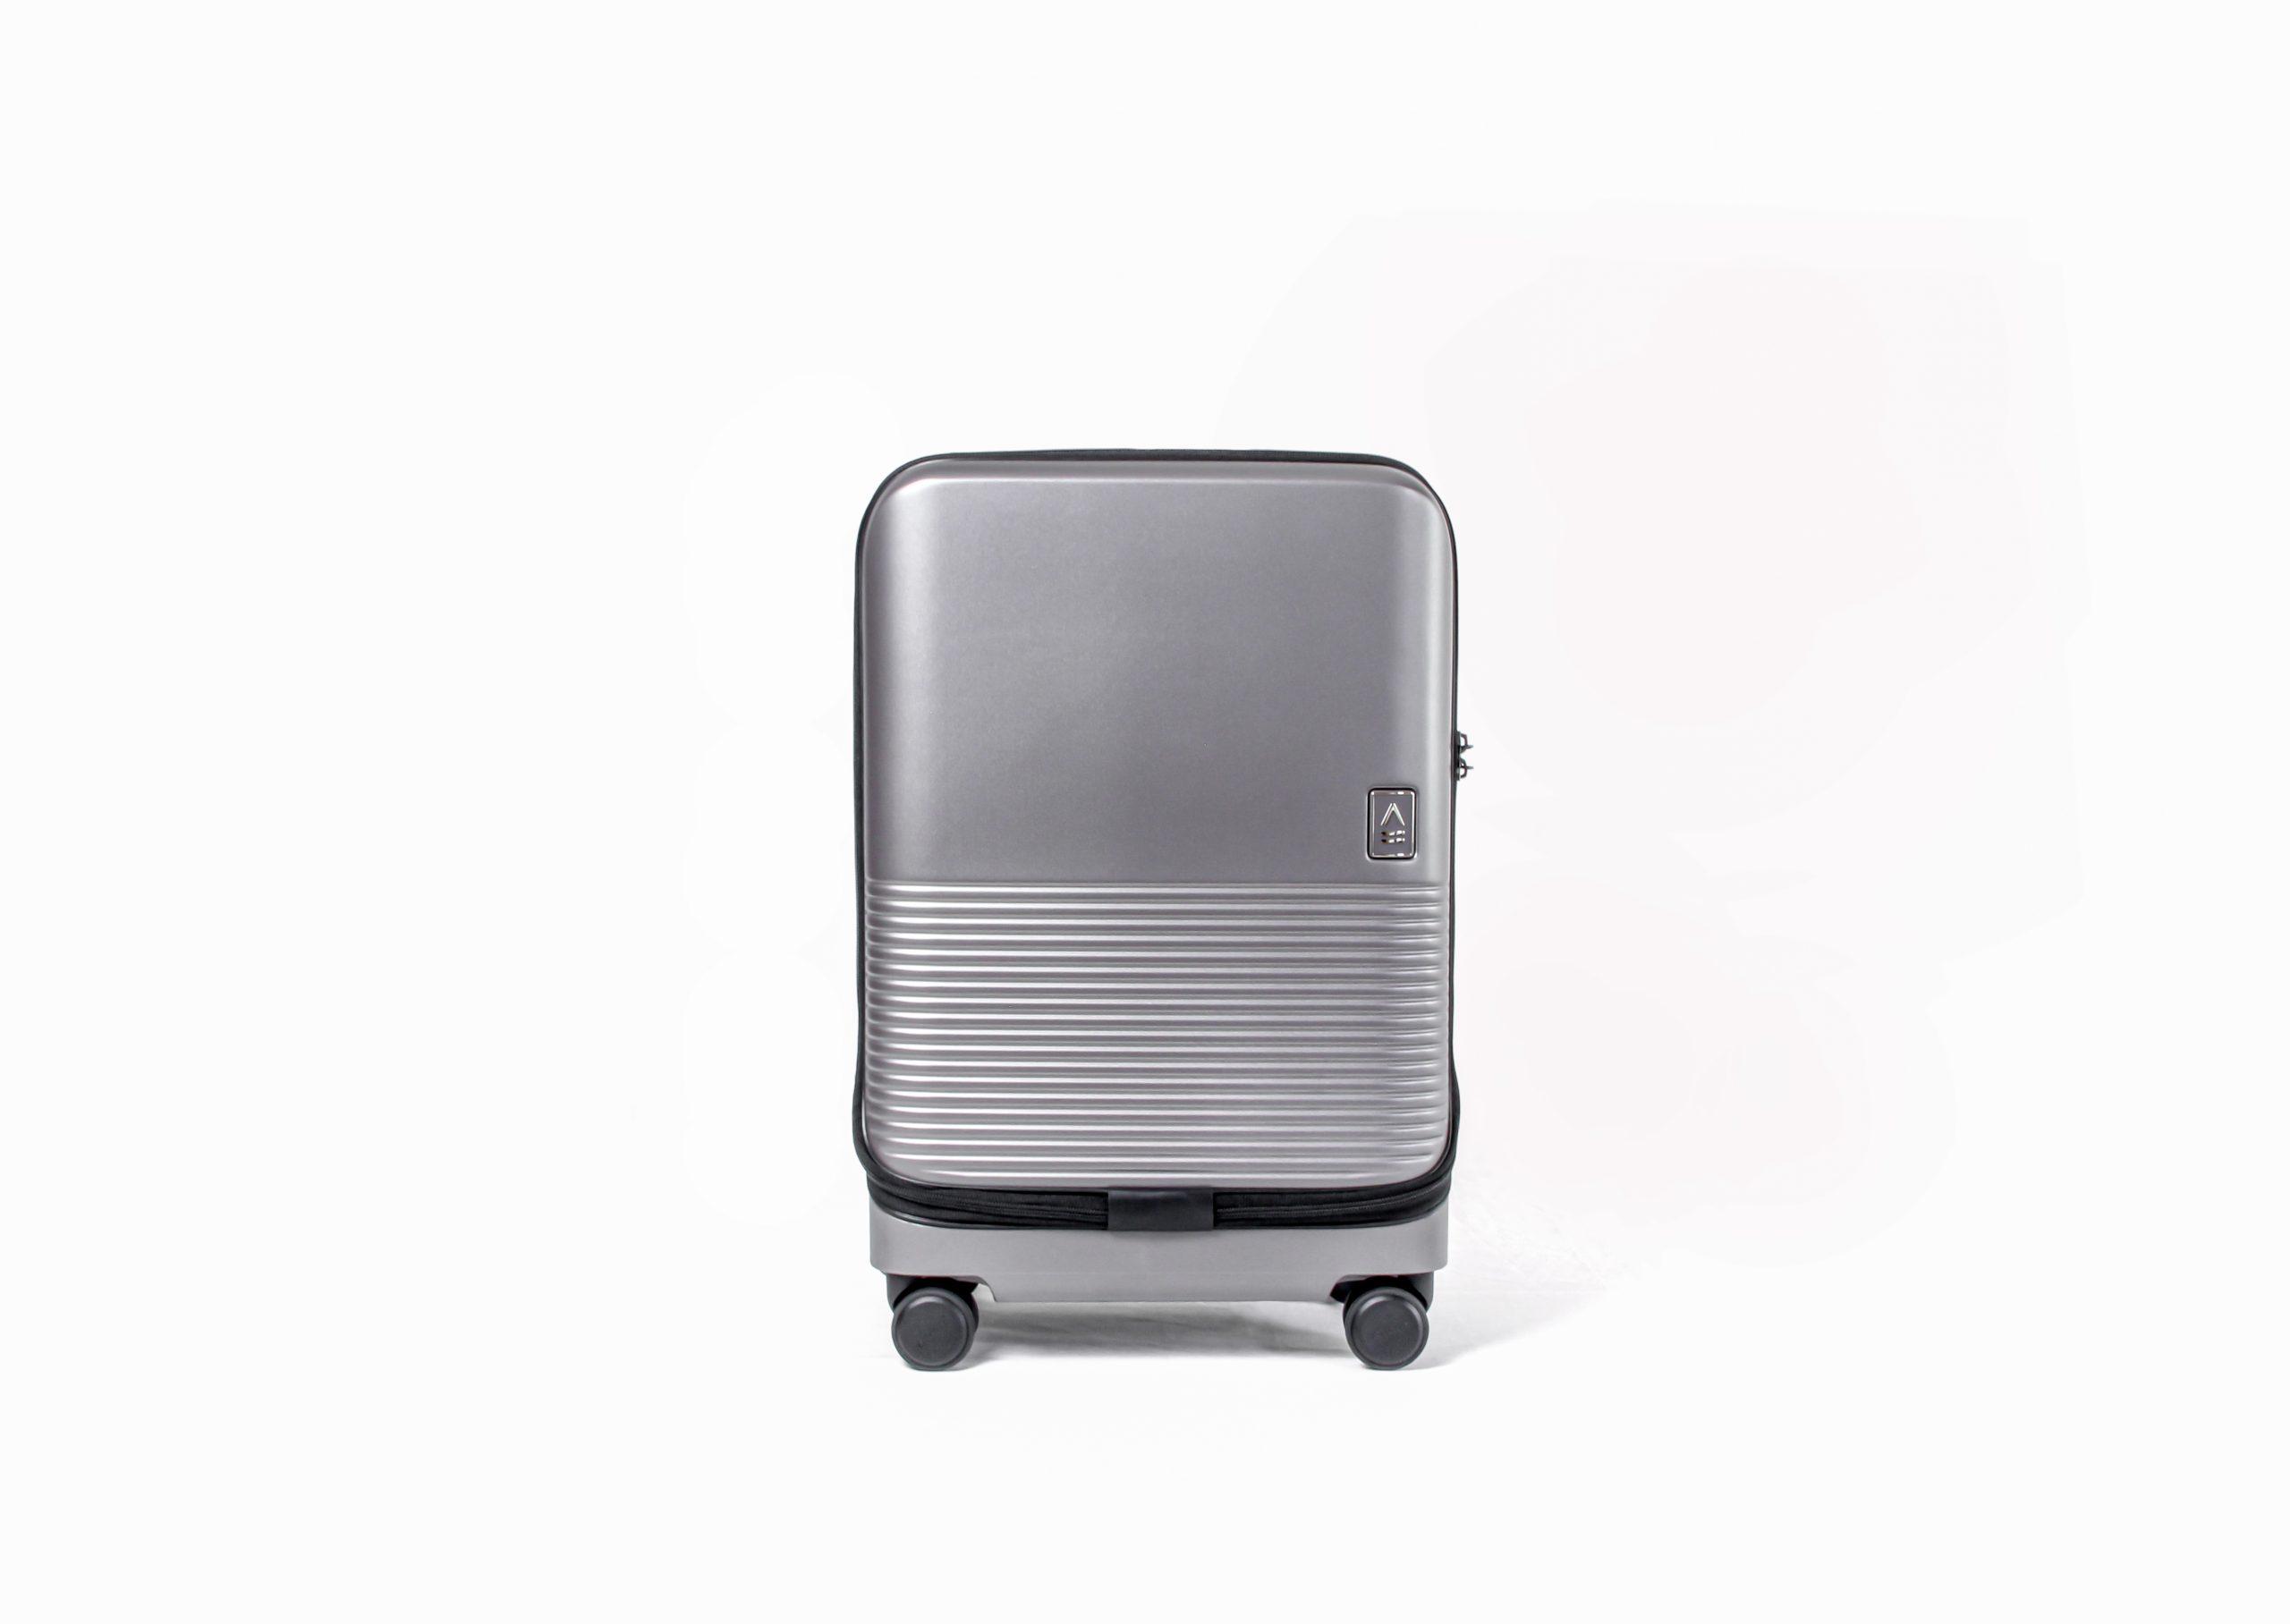 "APPERCASE 20"" SPLIT LIGHT Suitcase 行李箱 (Titanium / Black)"